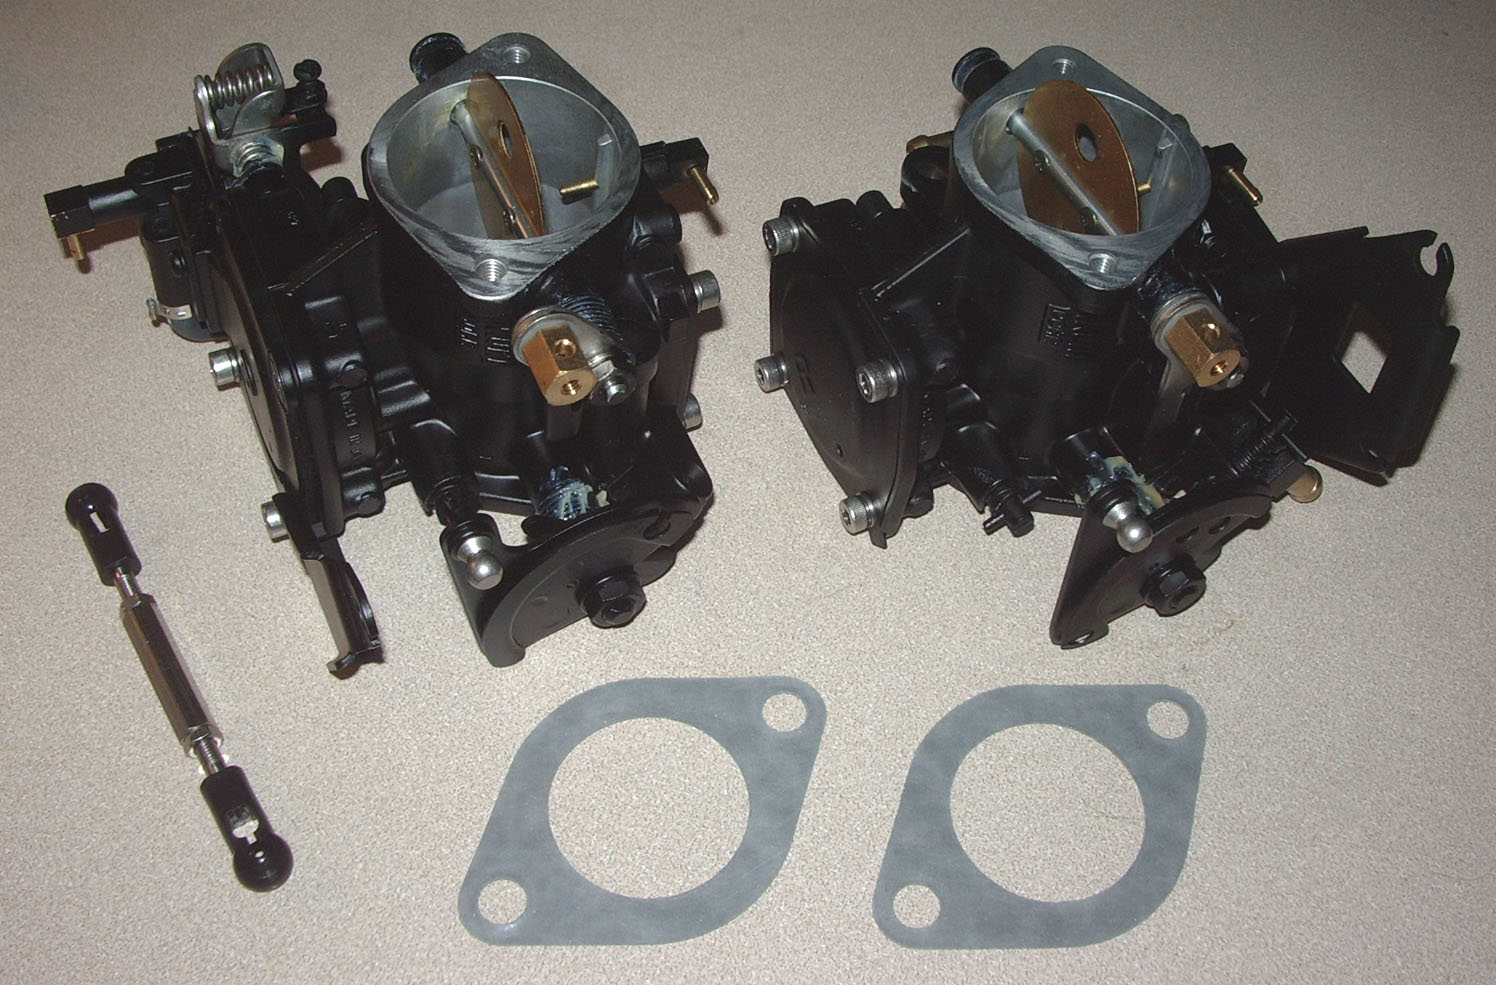 sea doo jet ski parts diagram wiring for a jvc car stereo how to rebuild carburetor diy